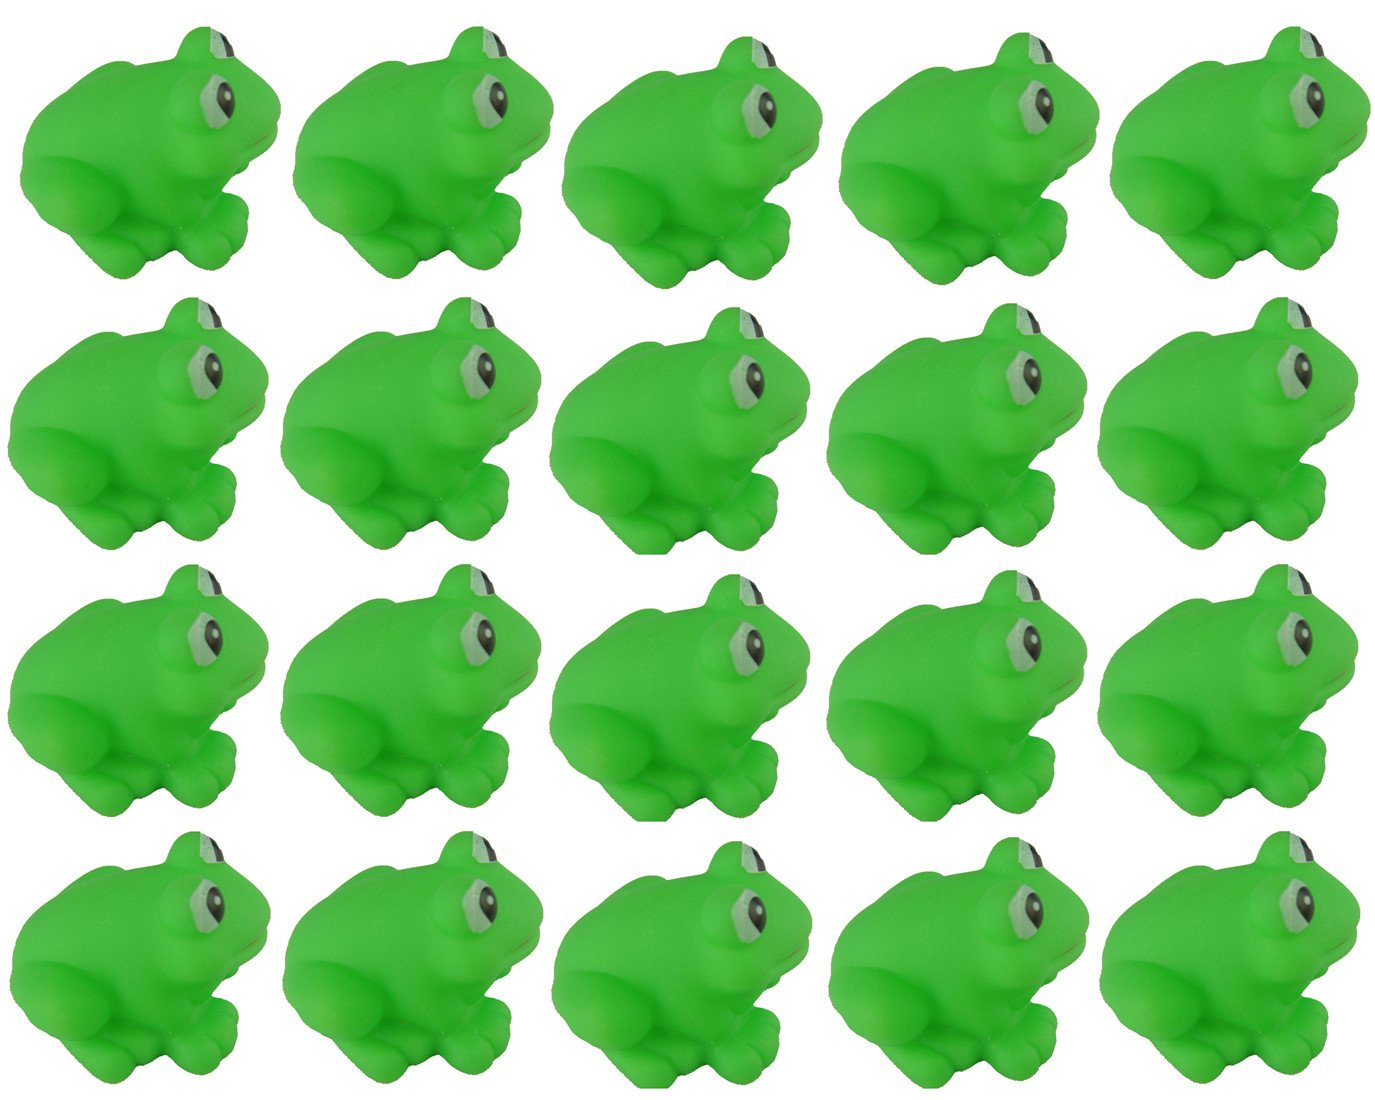 Amazon.com : SPHTOEO 12pcs Frogs Baby Bath Tub Bathing Rubber ...